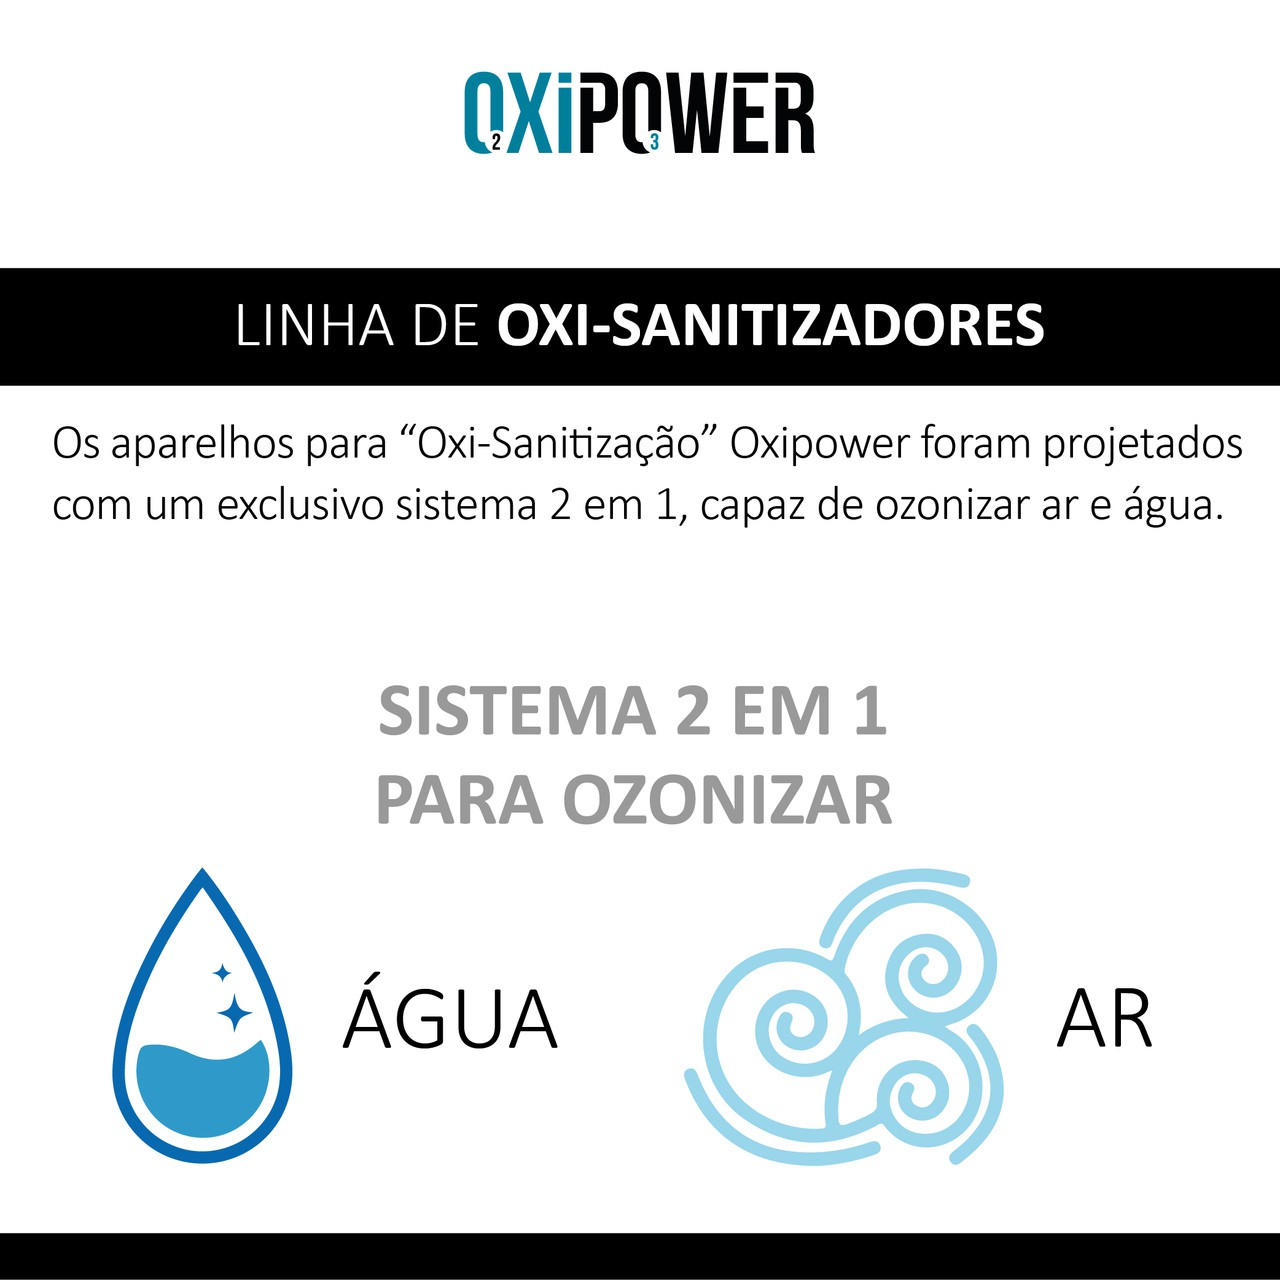 OXPW 10 - OXI-SANITIZADOR 2X1 PARA OZONIZADOR AR E ÁGUA - OXI 250.50